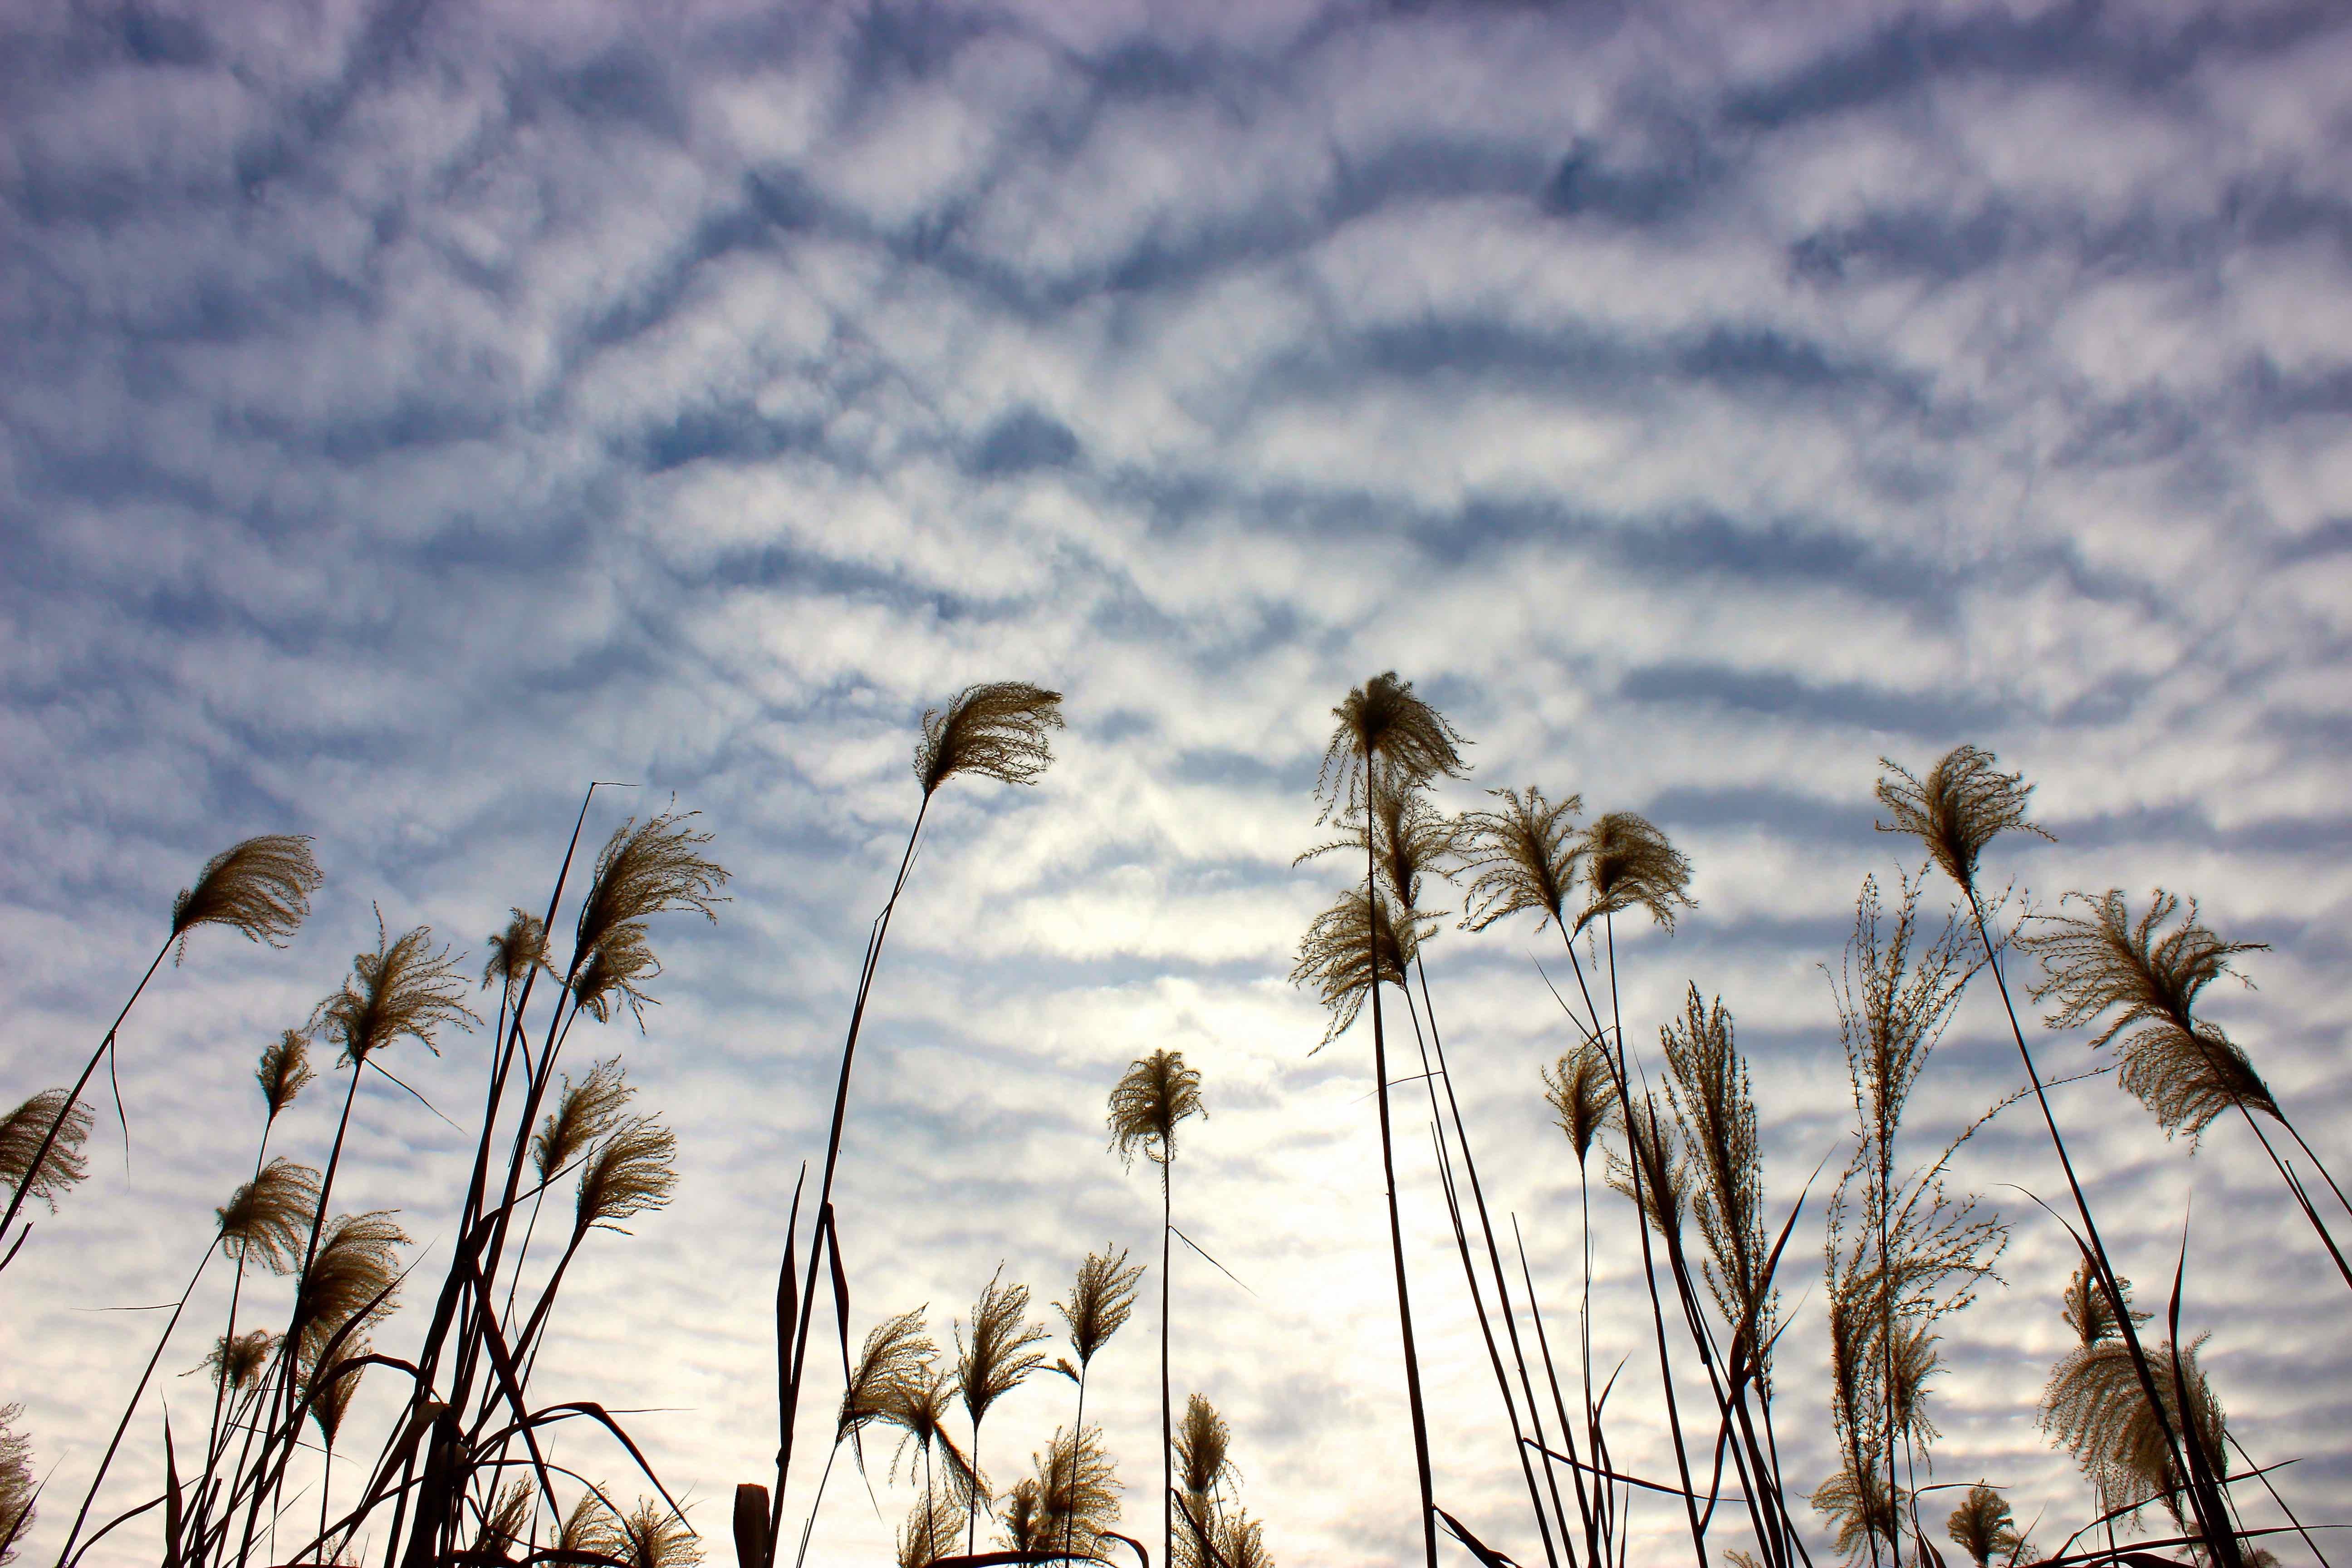 Paisaje, nubes, Natalia Pfeifer, Galeria MOA, fotografía, arte, decoración, Japon